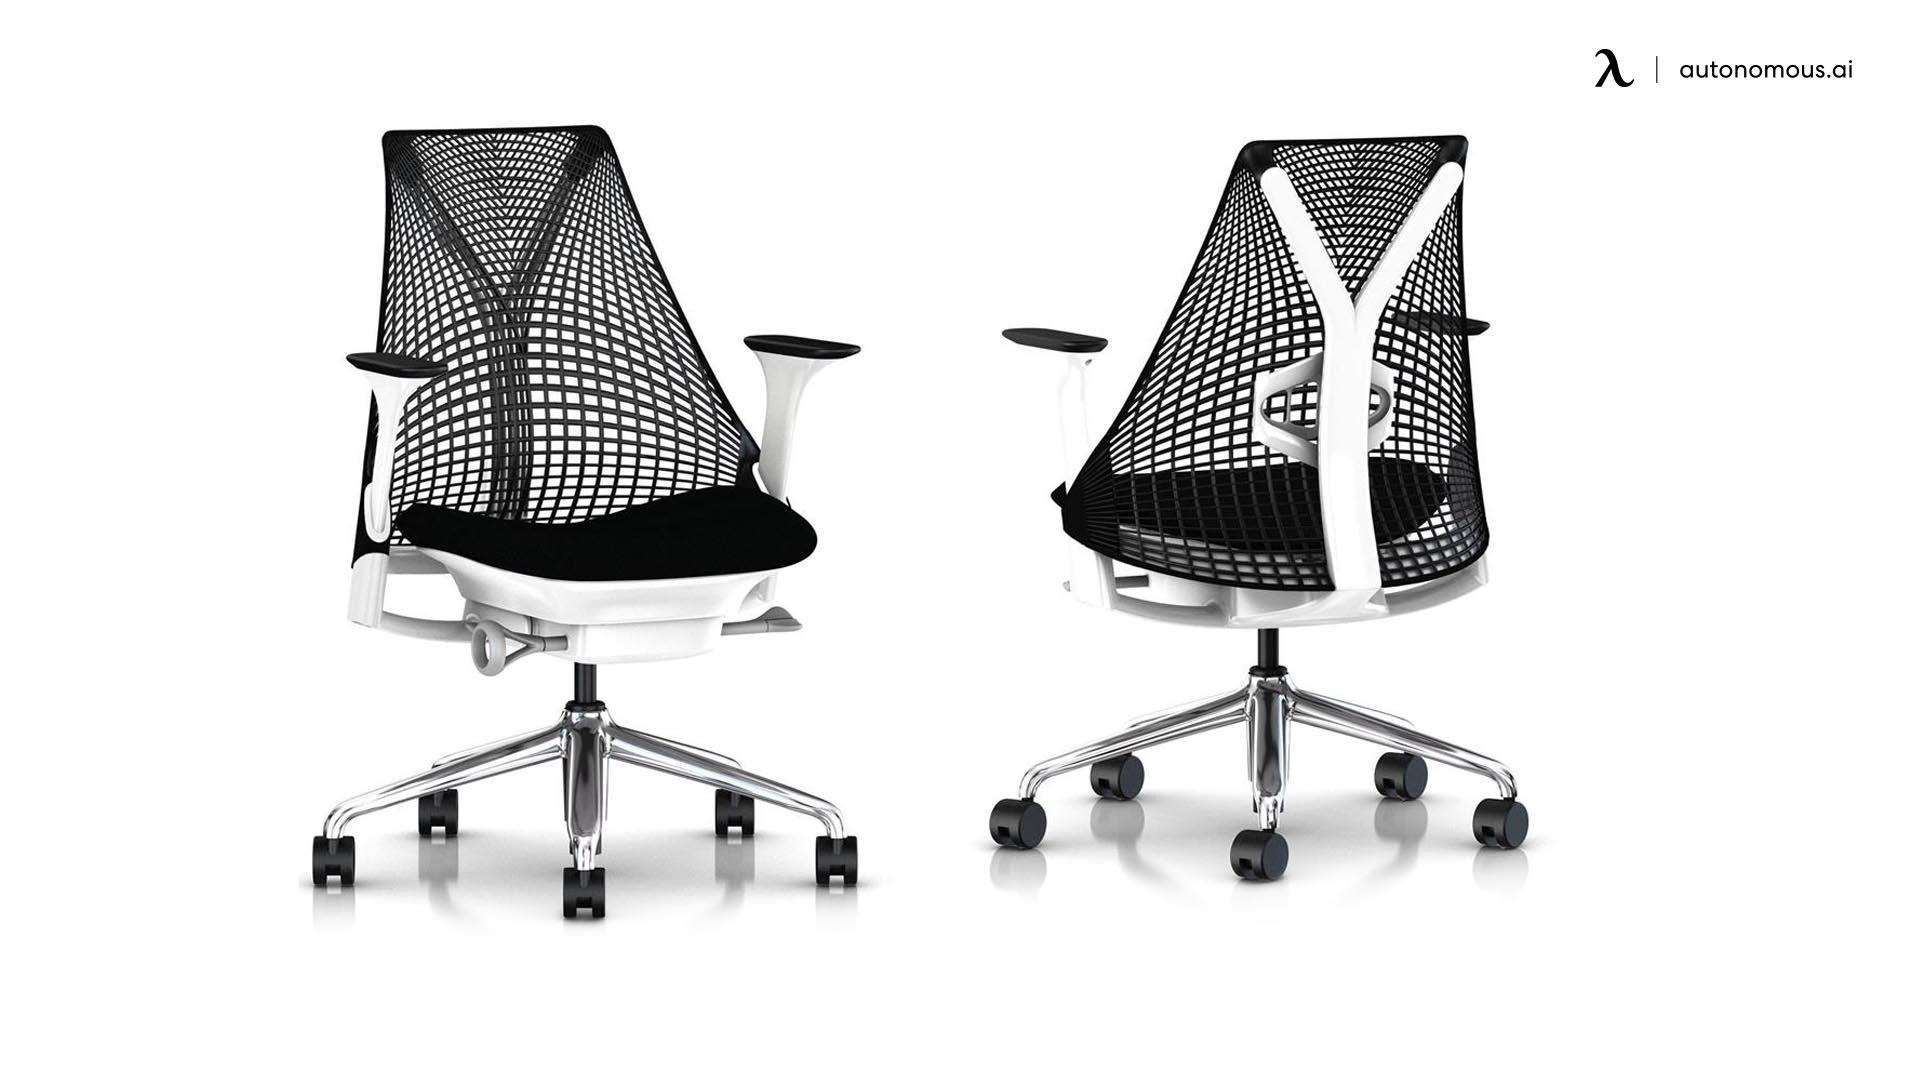 The Herman Miller Sayl Ergonomic Office Chair